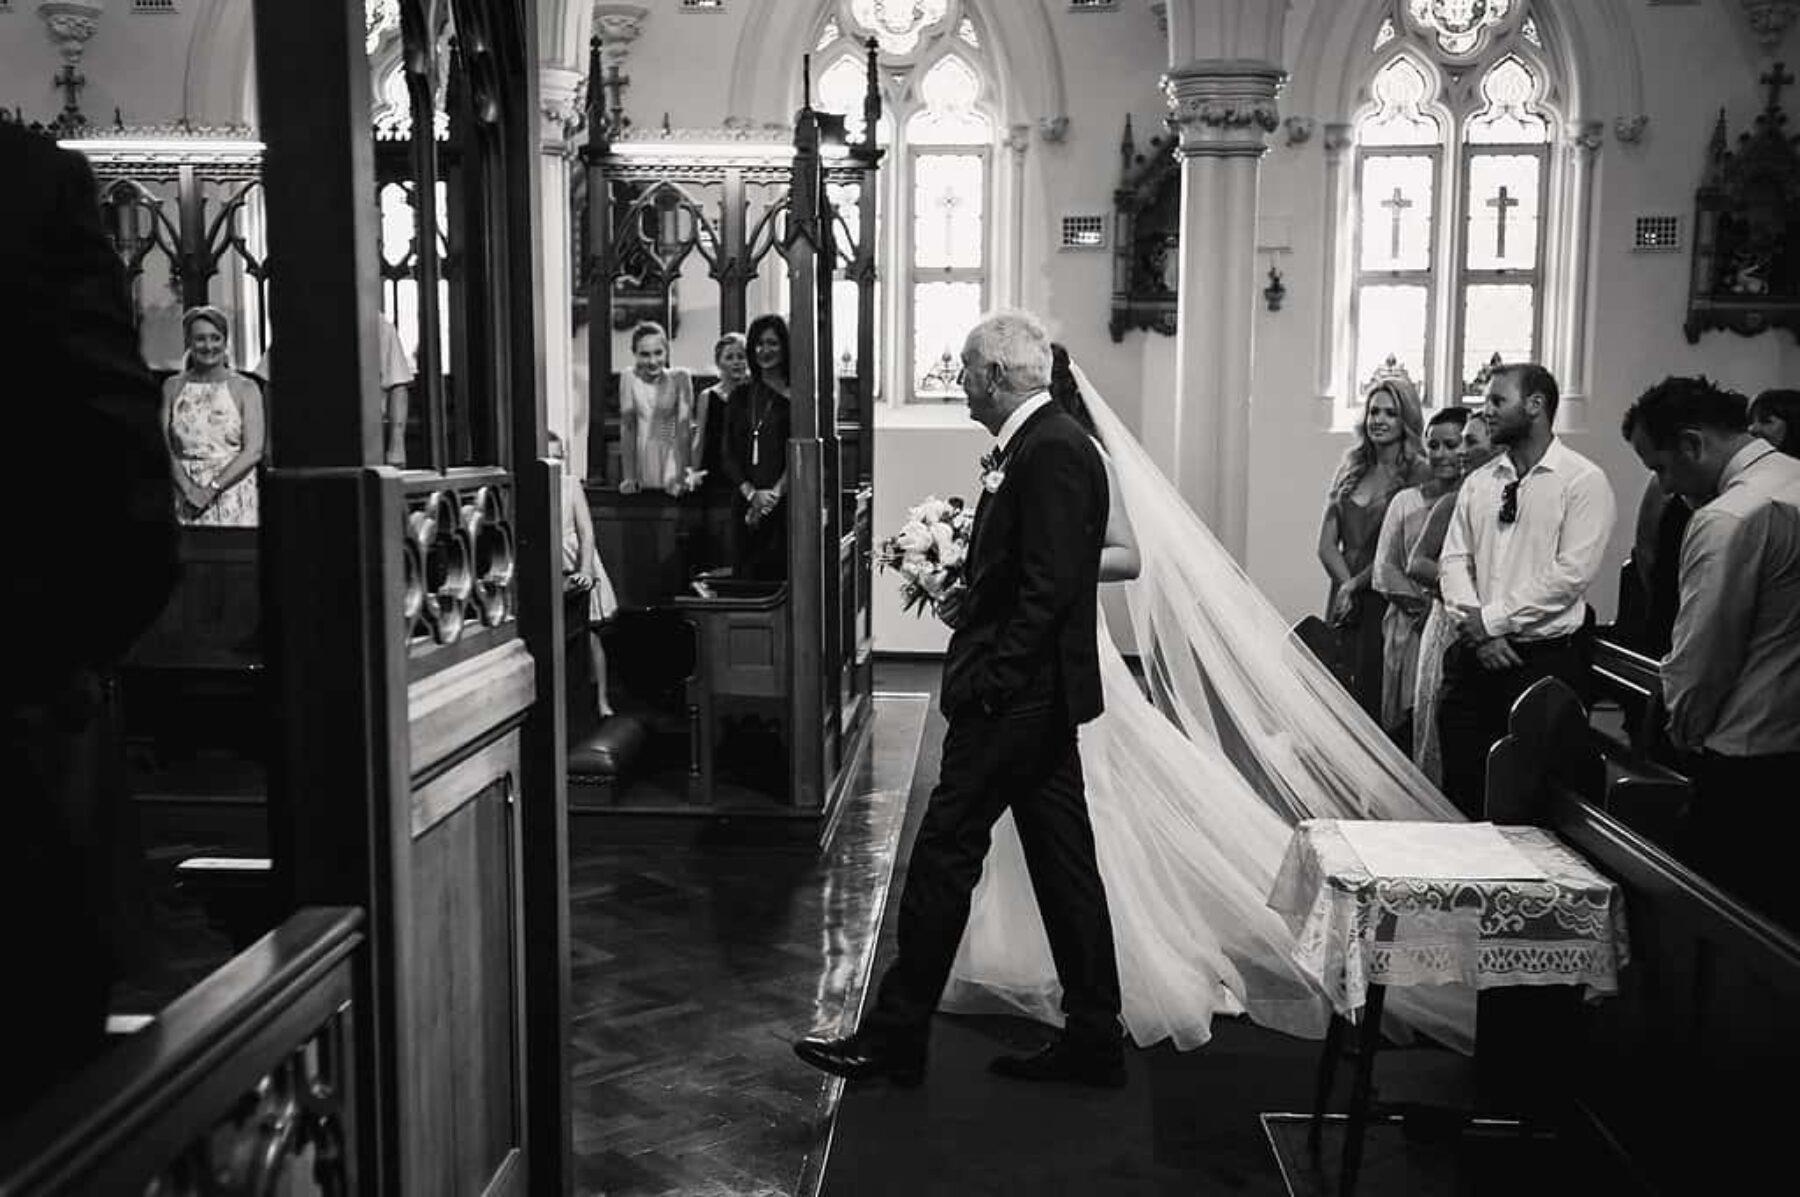 Mercedes College Chapel wedding